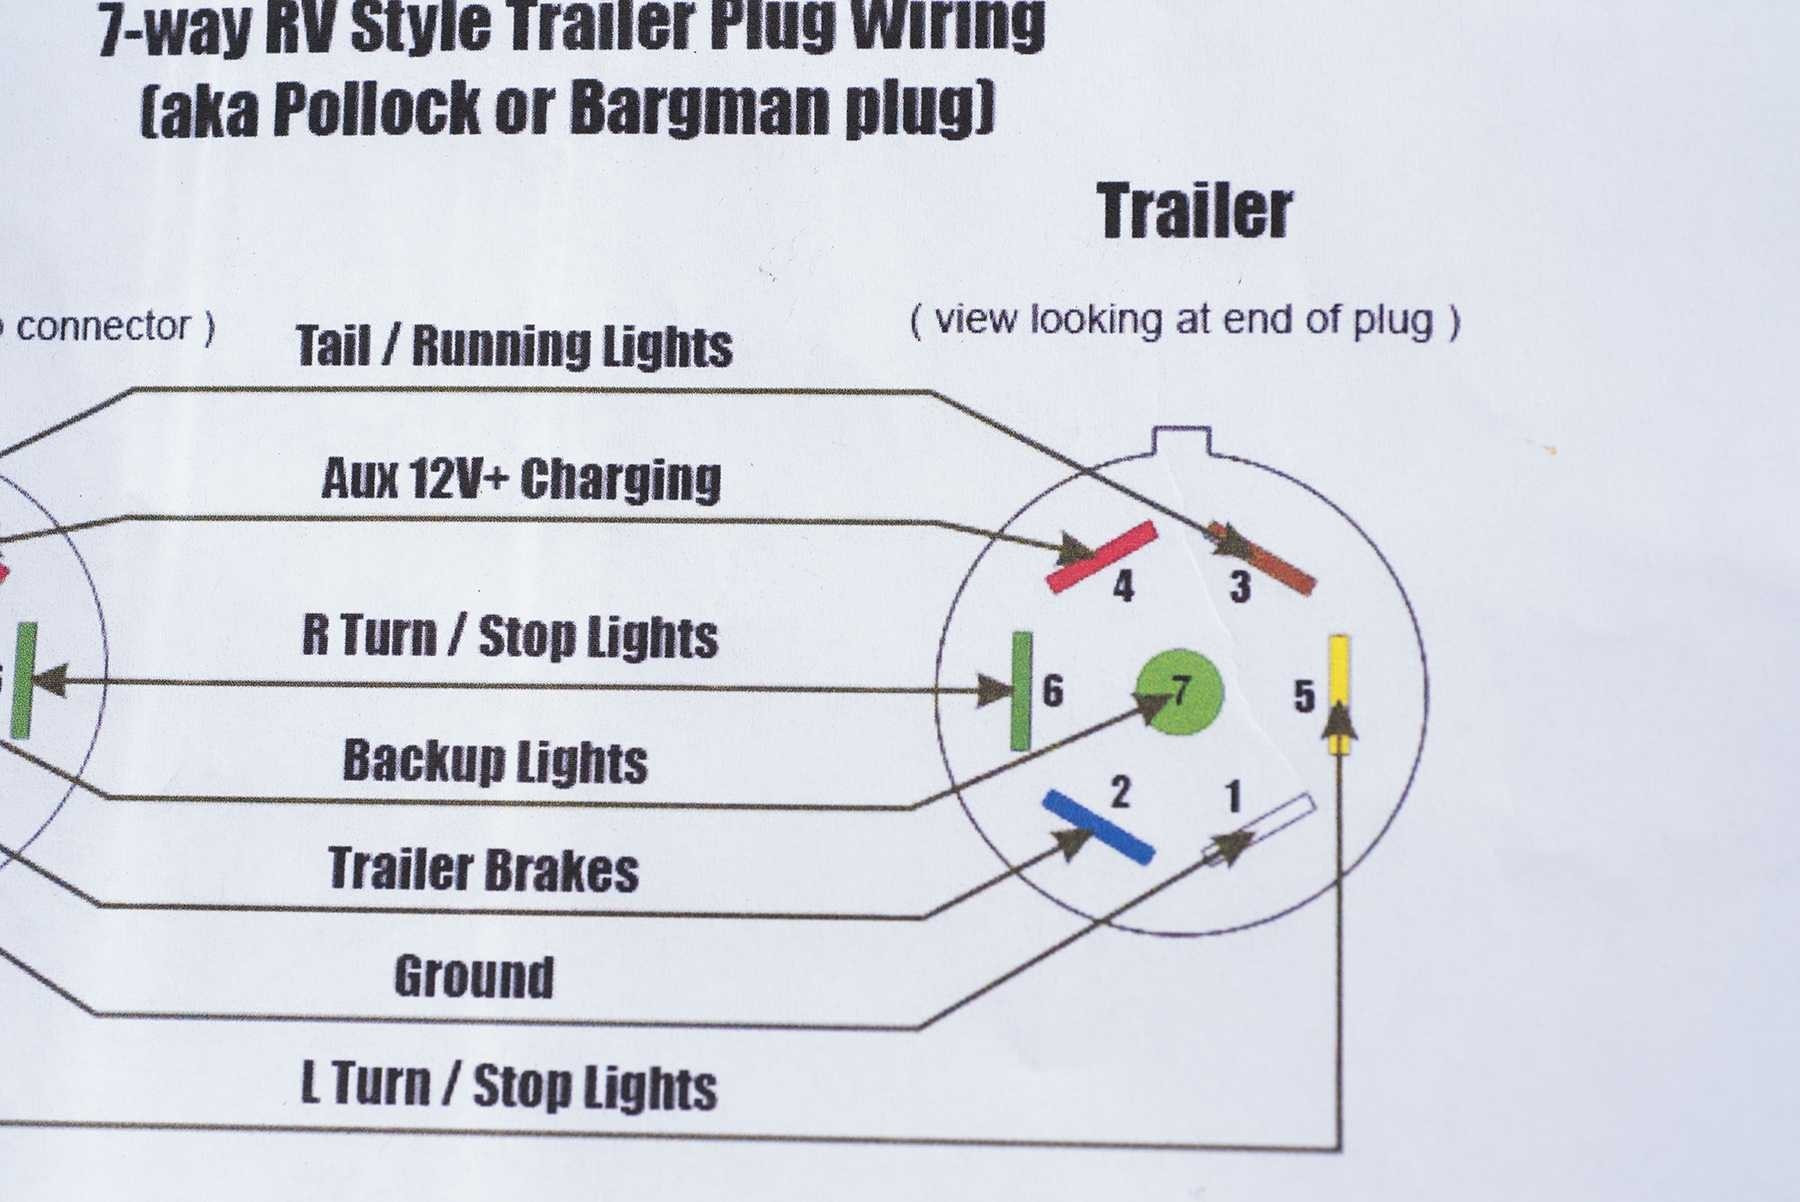 Hopkins Trailer Connector Wiring Diagram Reference Wiring Diagram - Receptacle Wiring Diagram